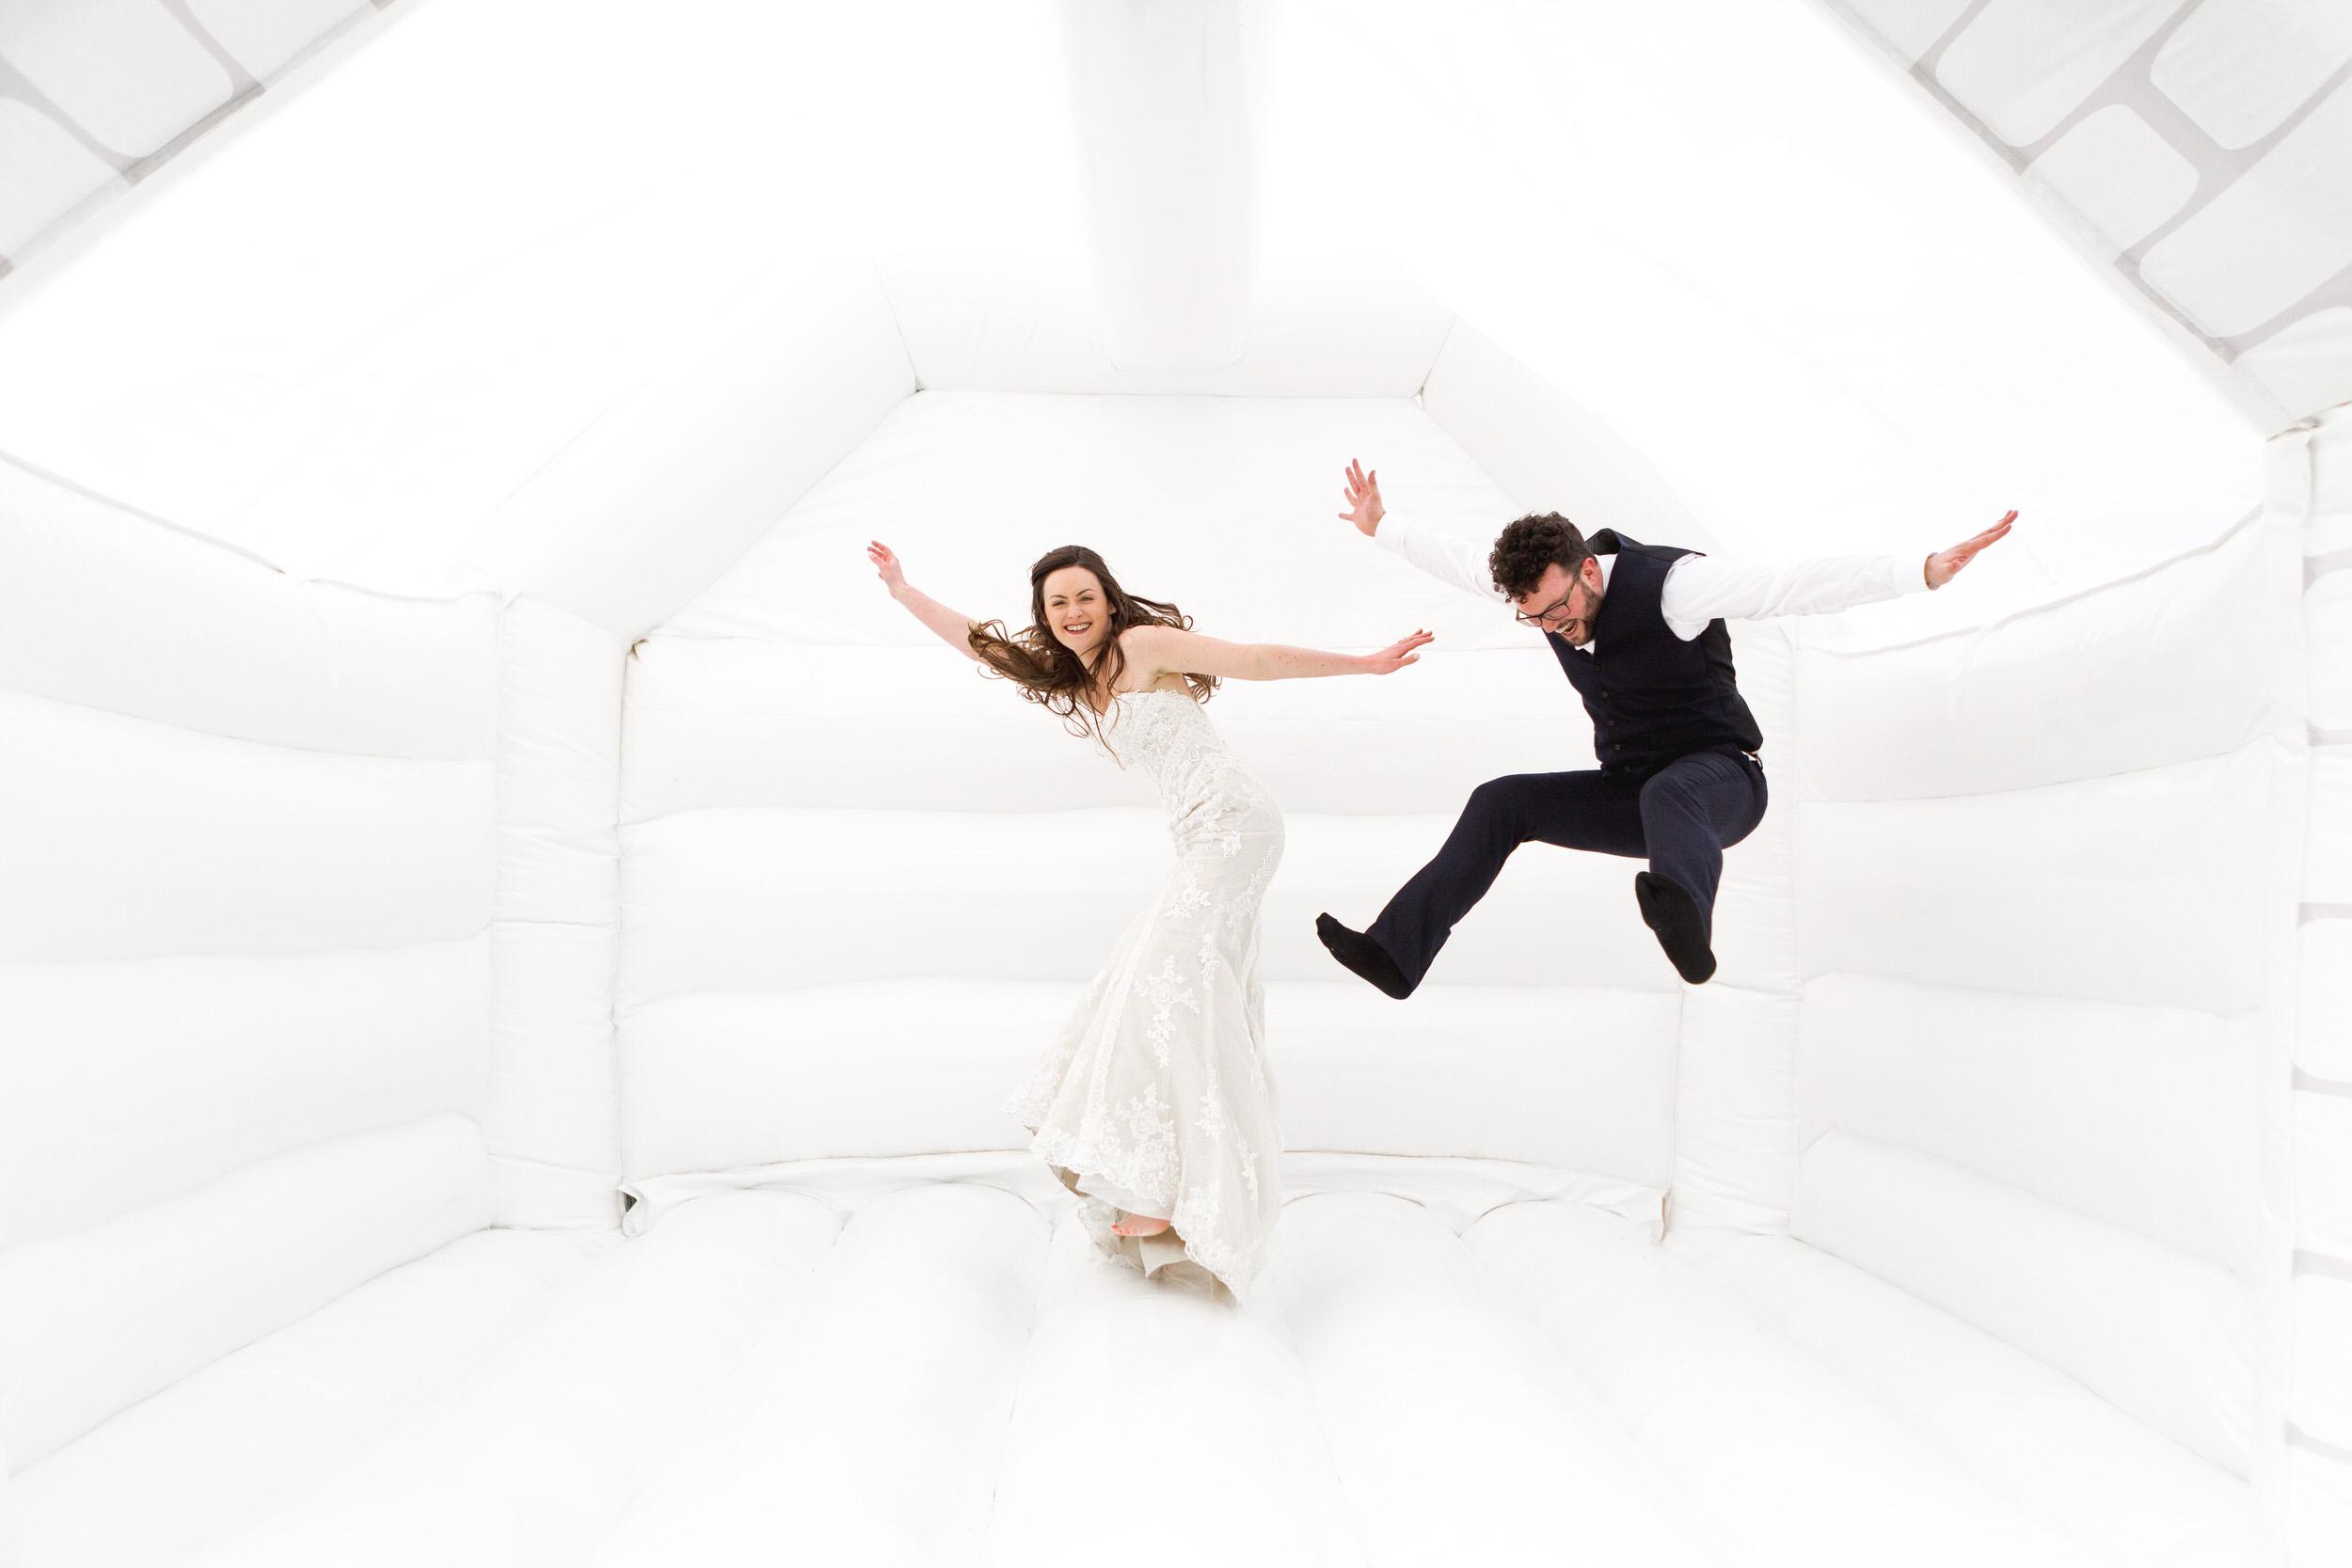 Launcells-Barton-Wedding-Photographer (445).jpg